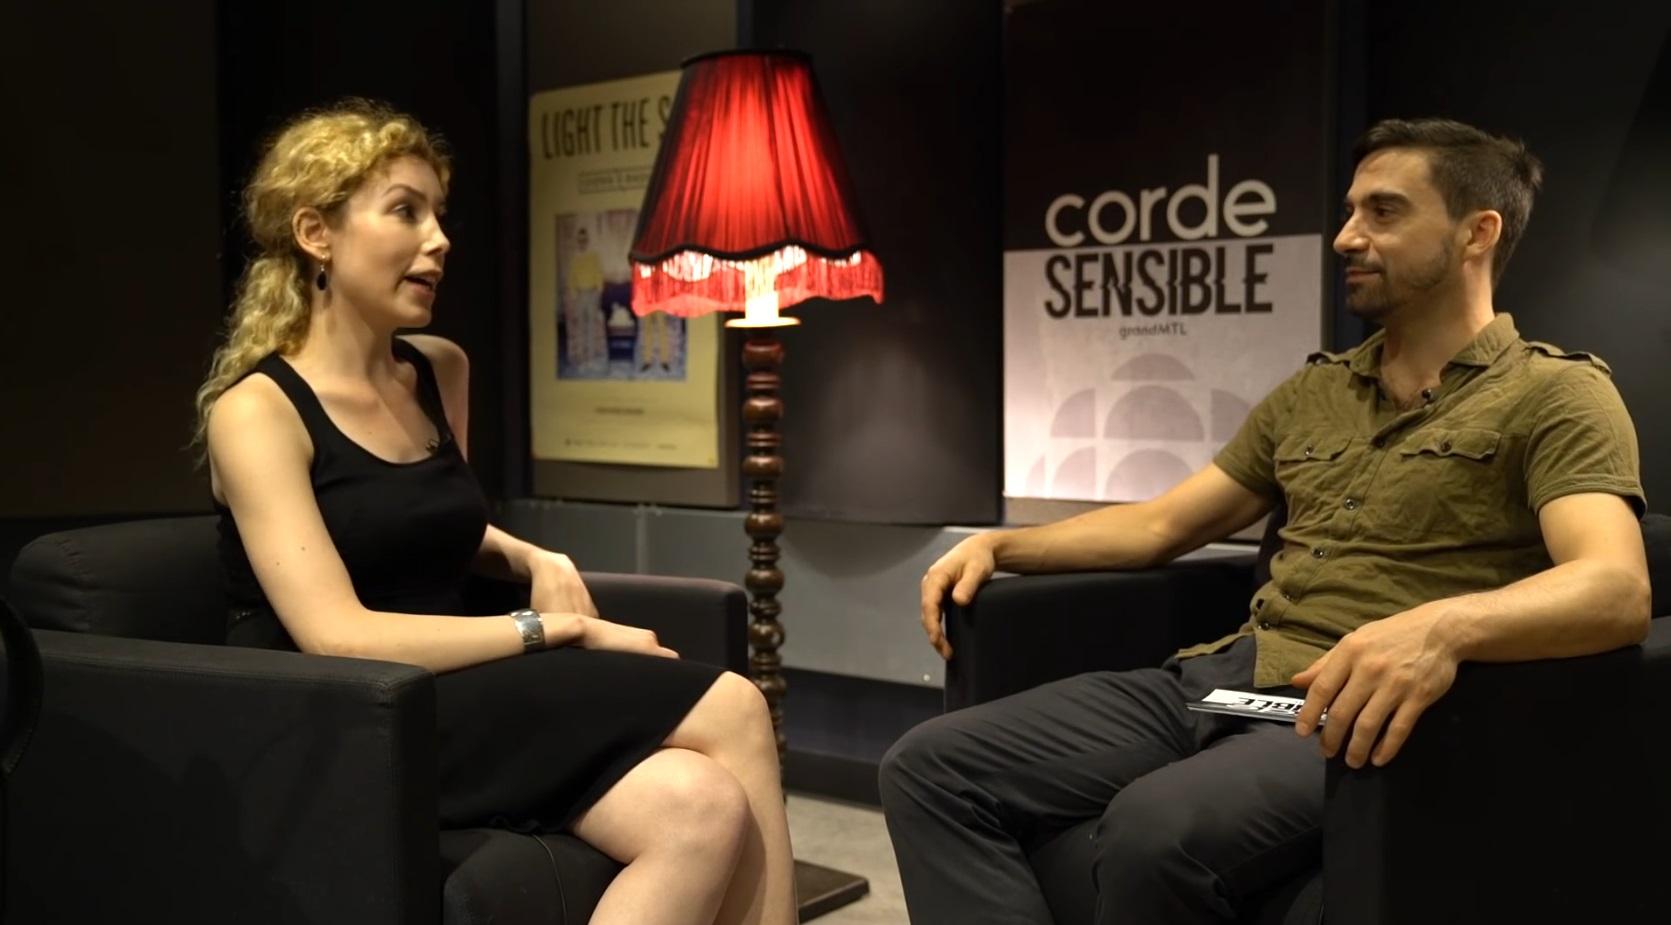 Corde sensible - ICI Grand Montréal